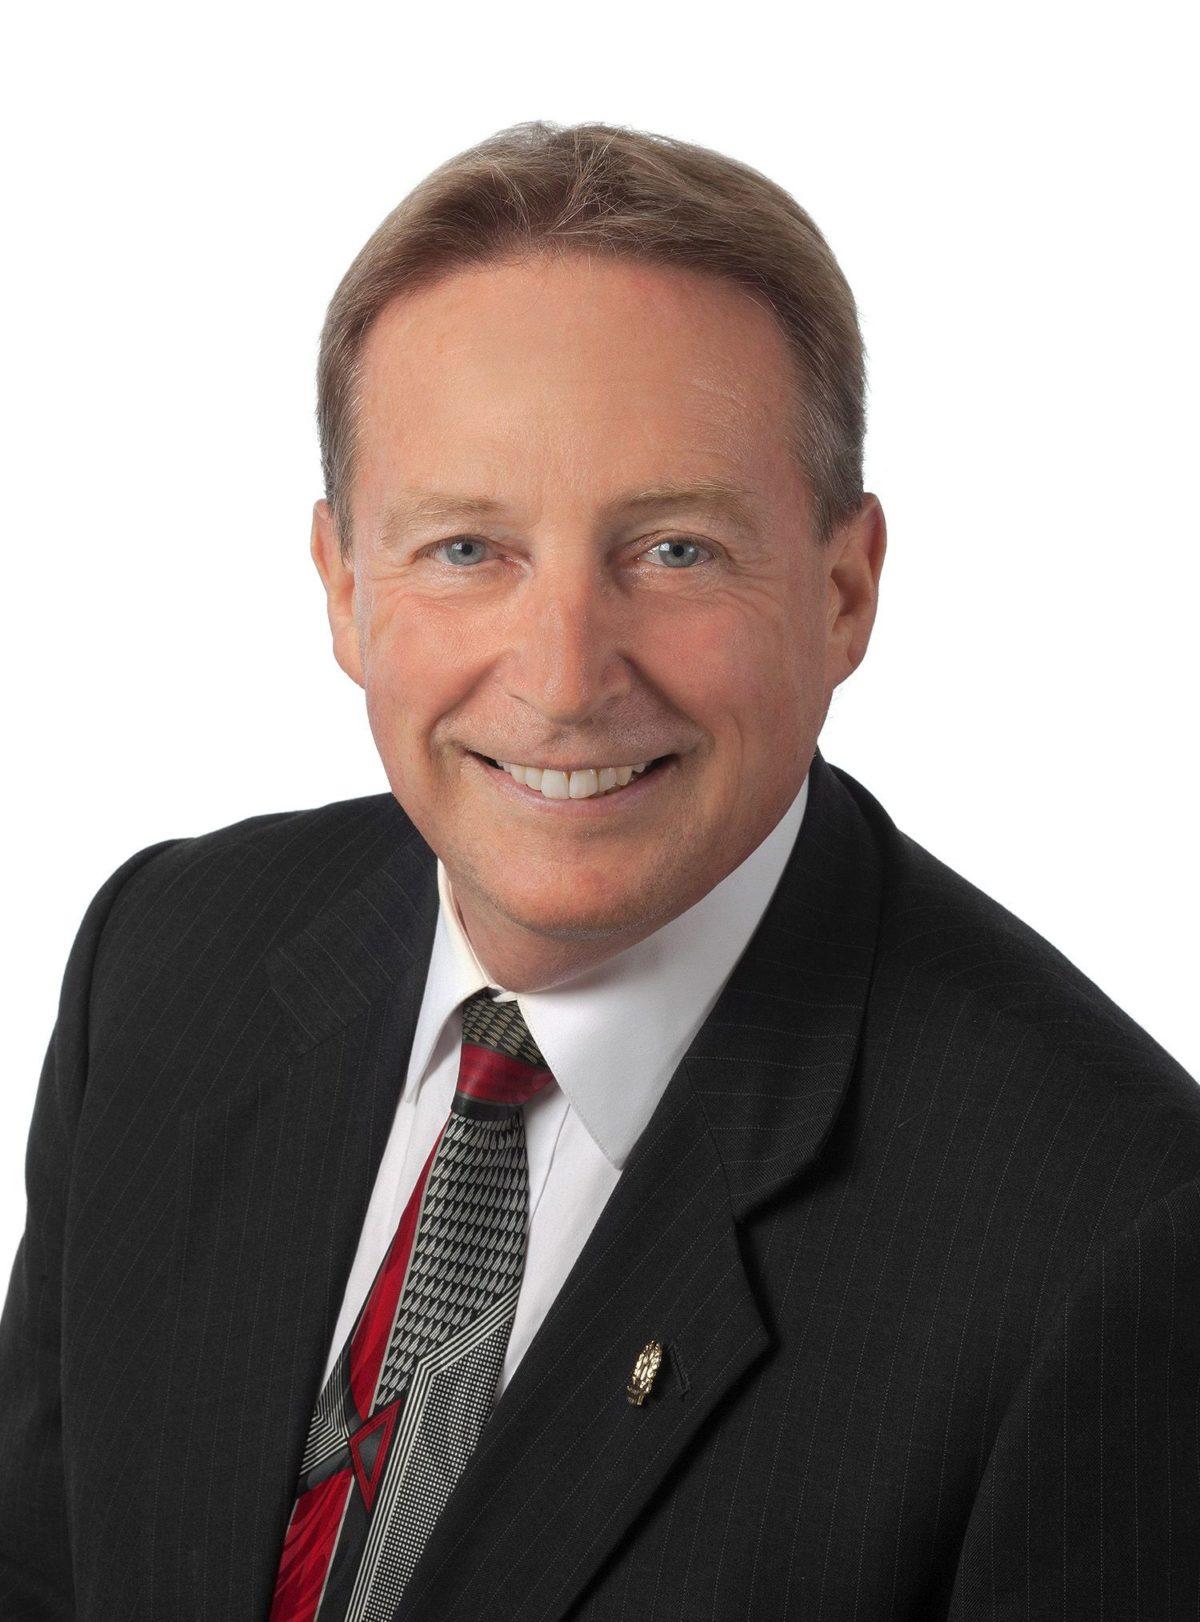 Ottawa Real Estate Board Announces New President for 2018